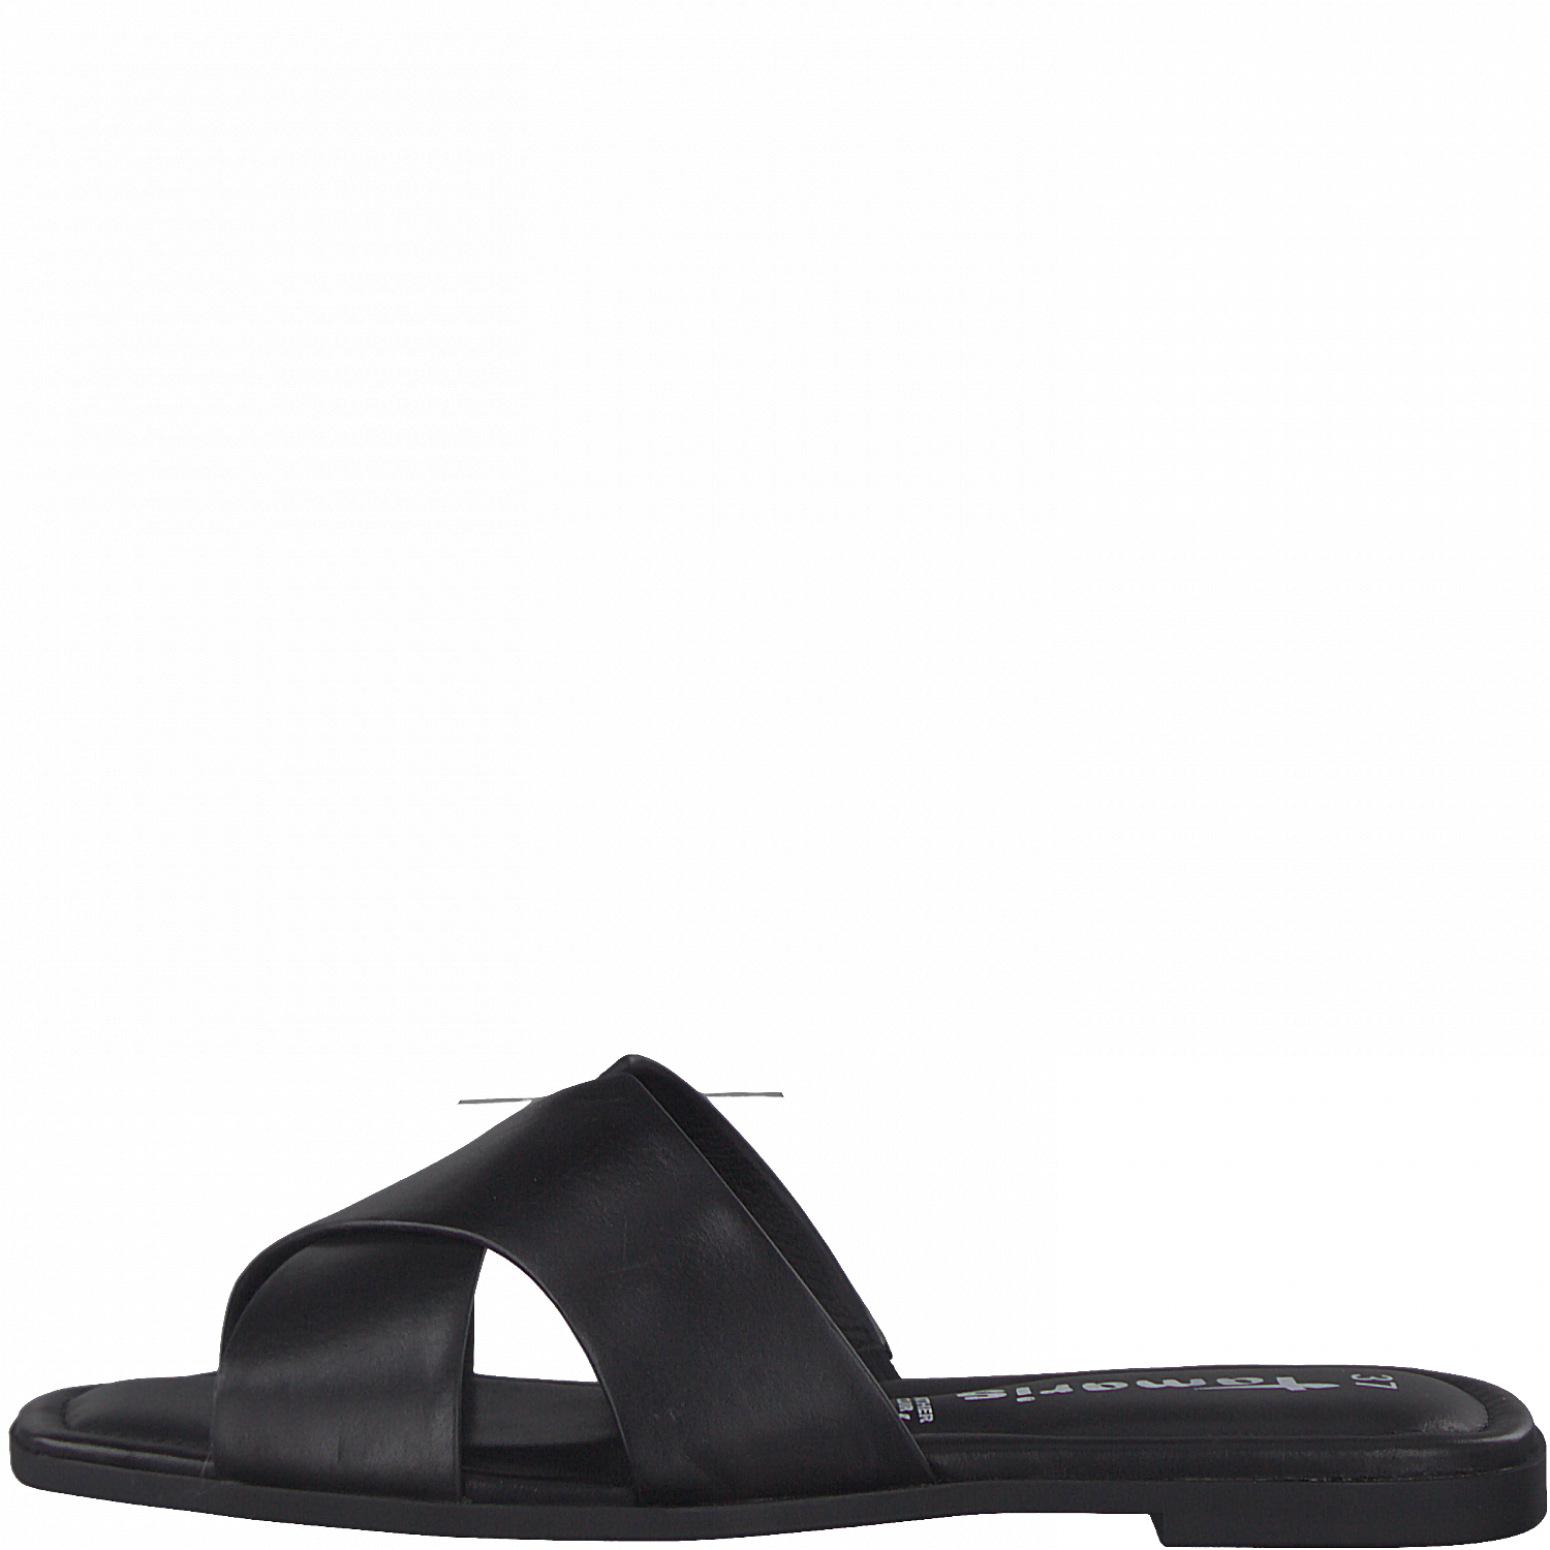 Tamaris 27104 sandal, black, 36